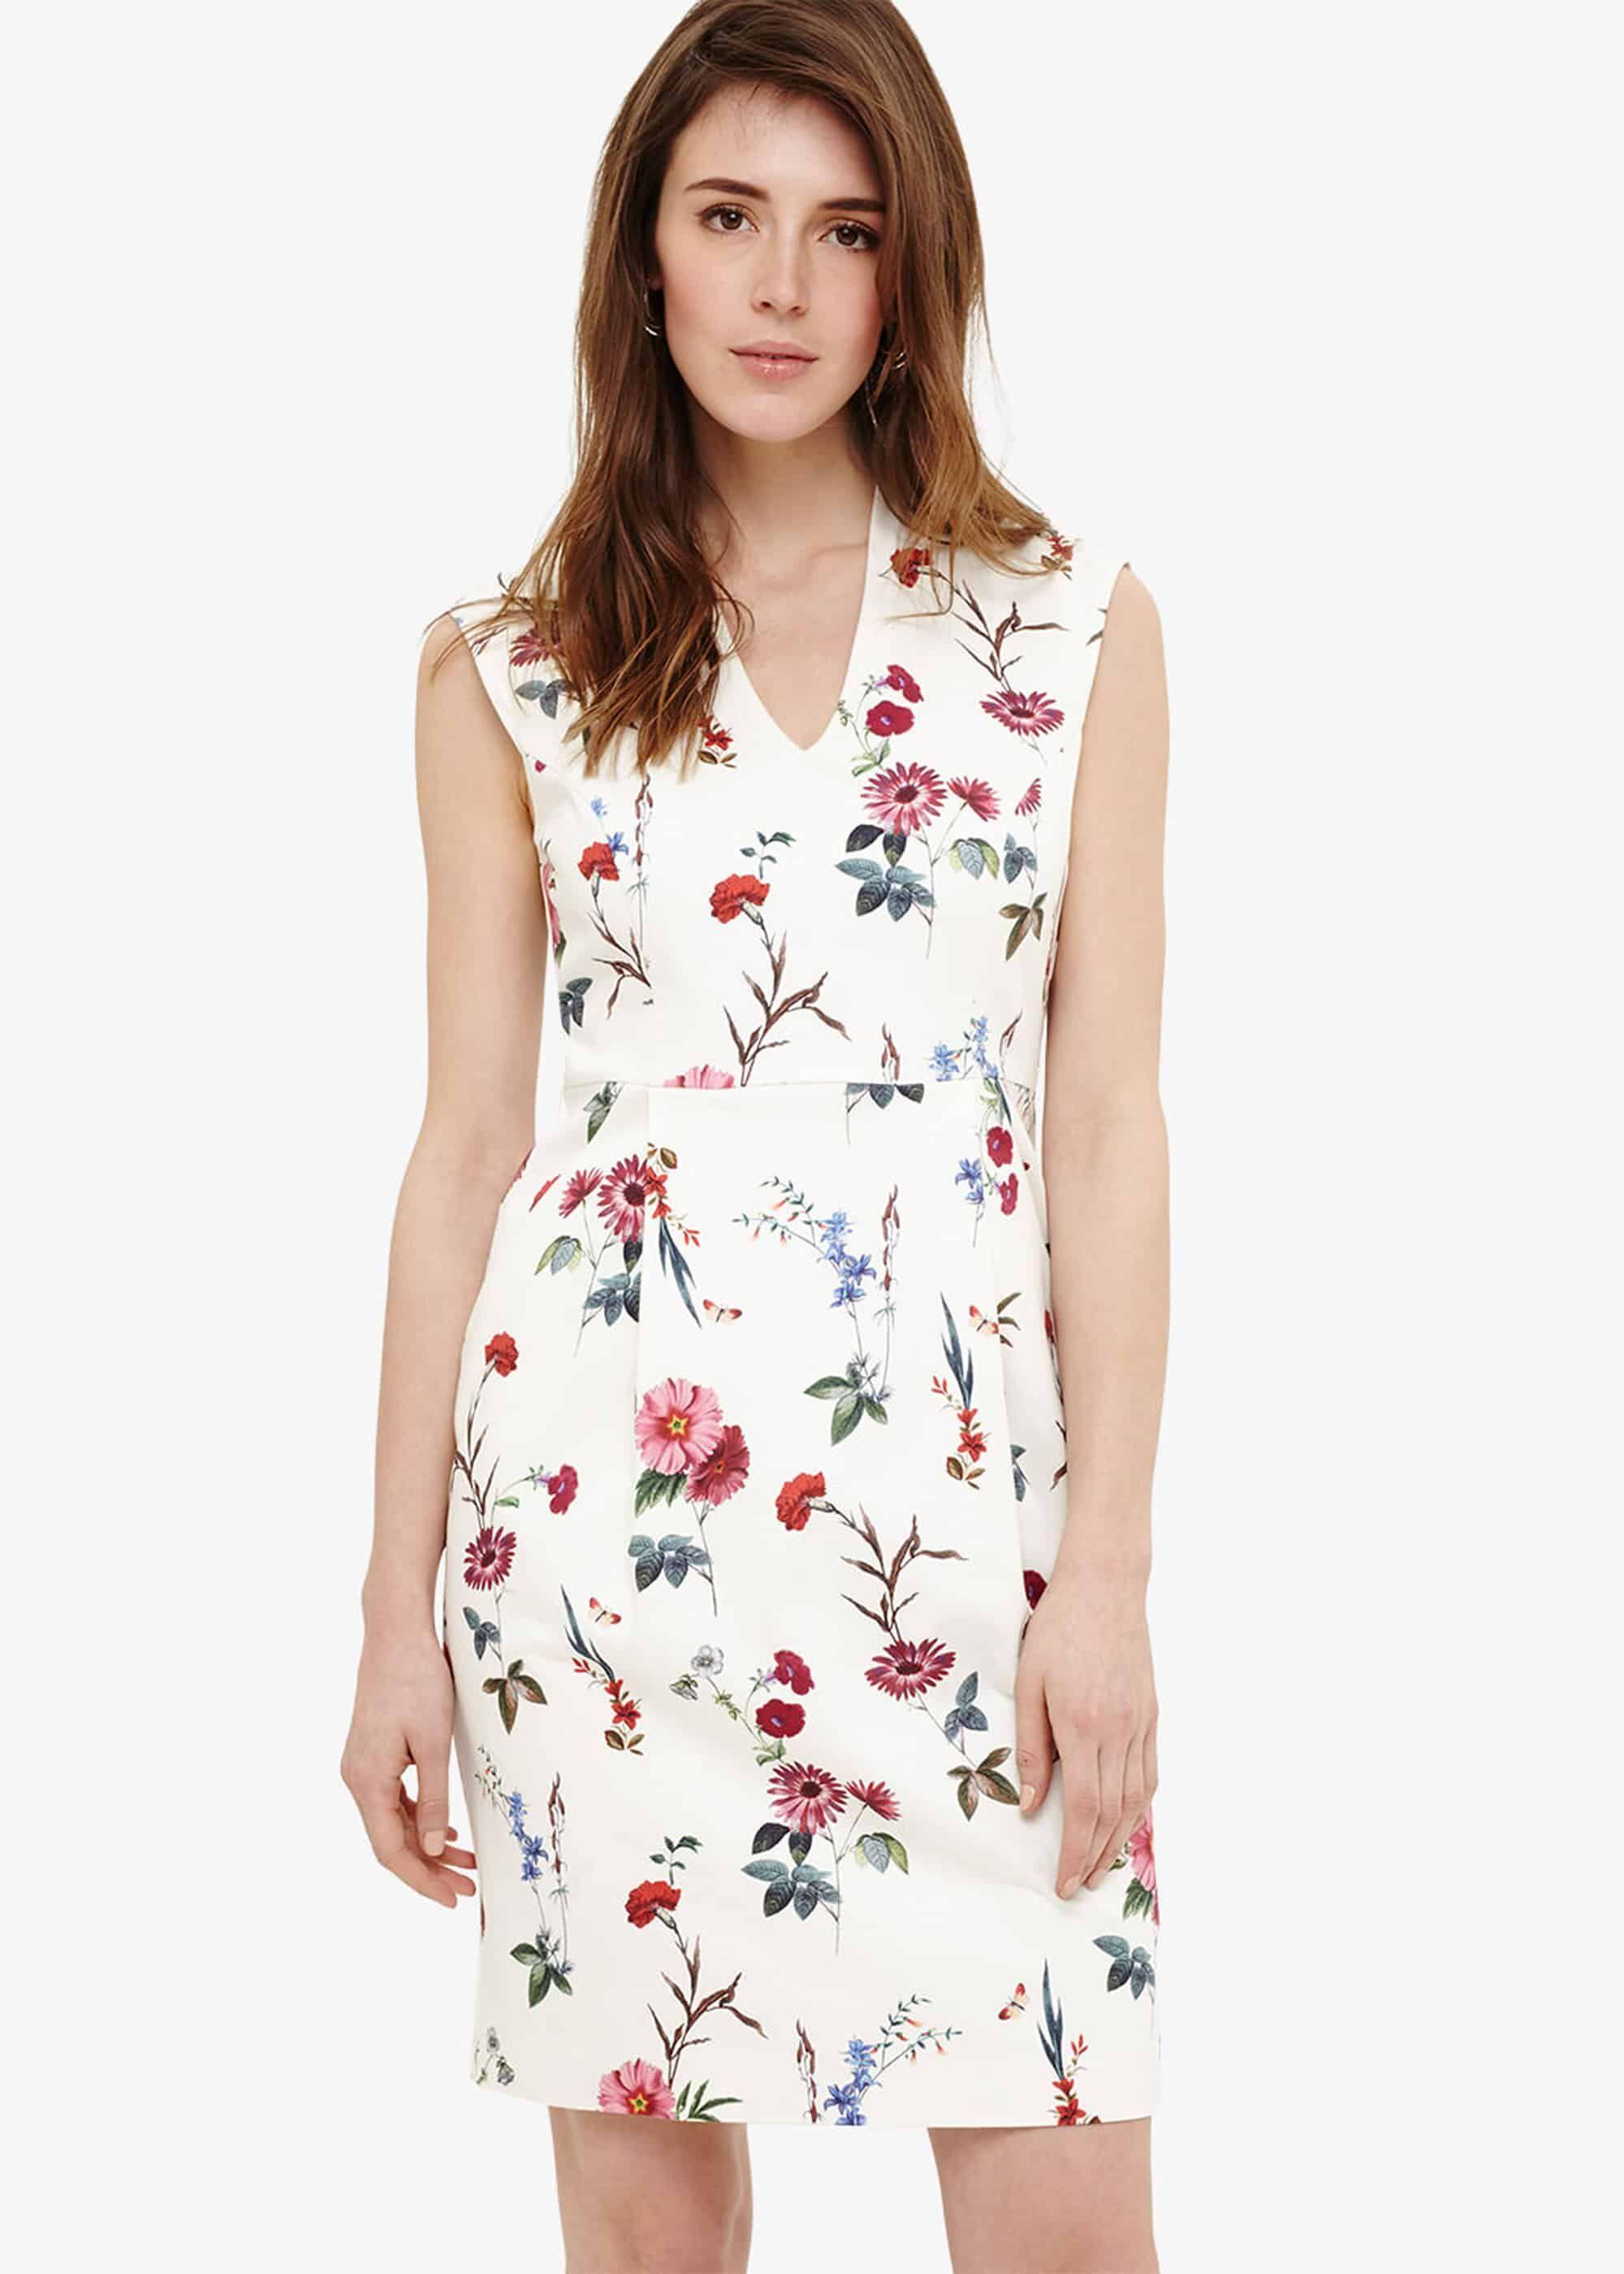 Saffie Floral Print Dress Reviews Phase Eight Online Reviews Feefo